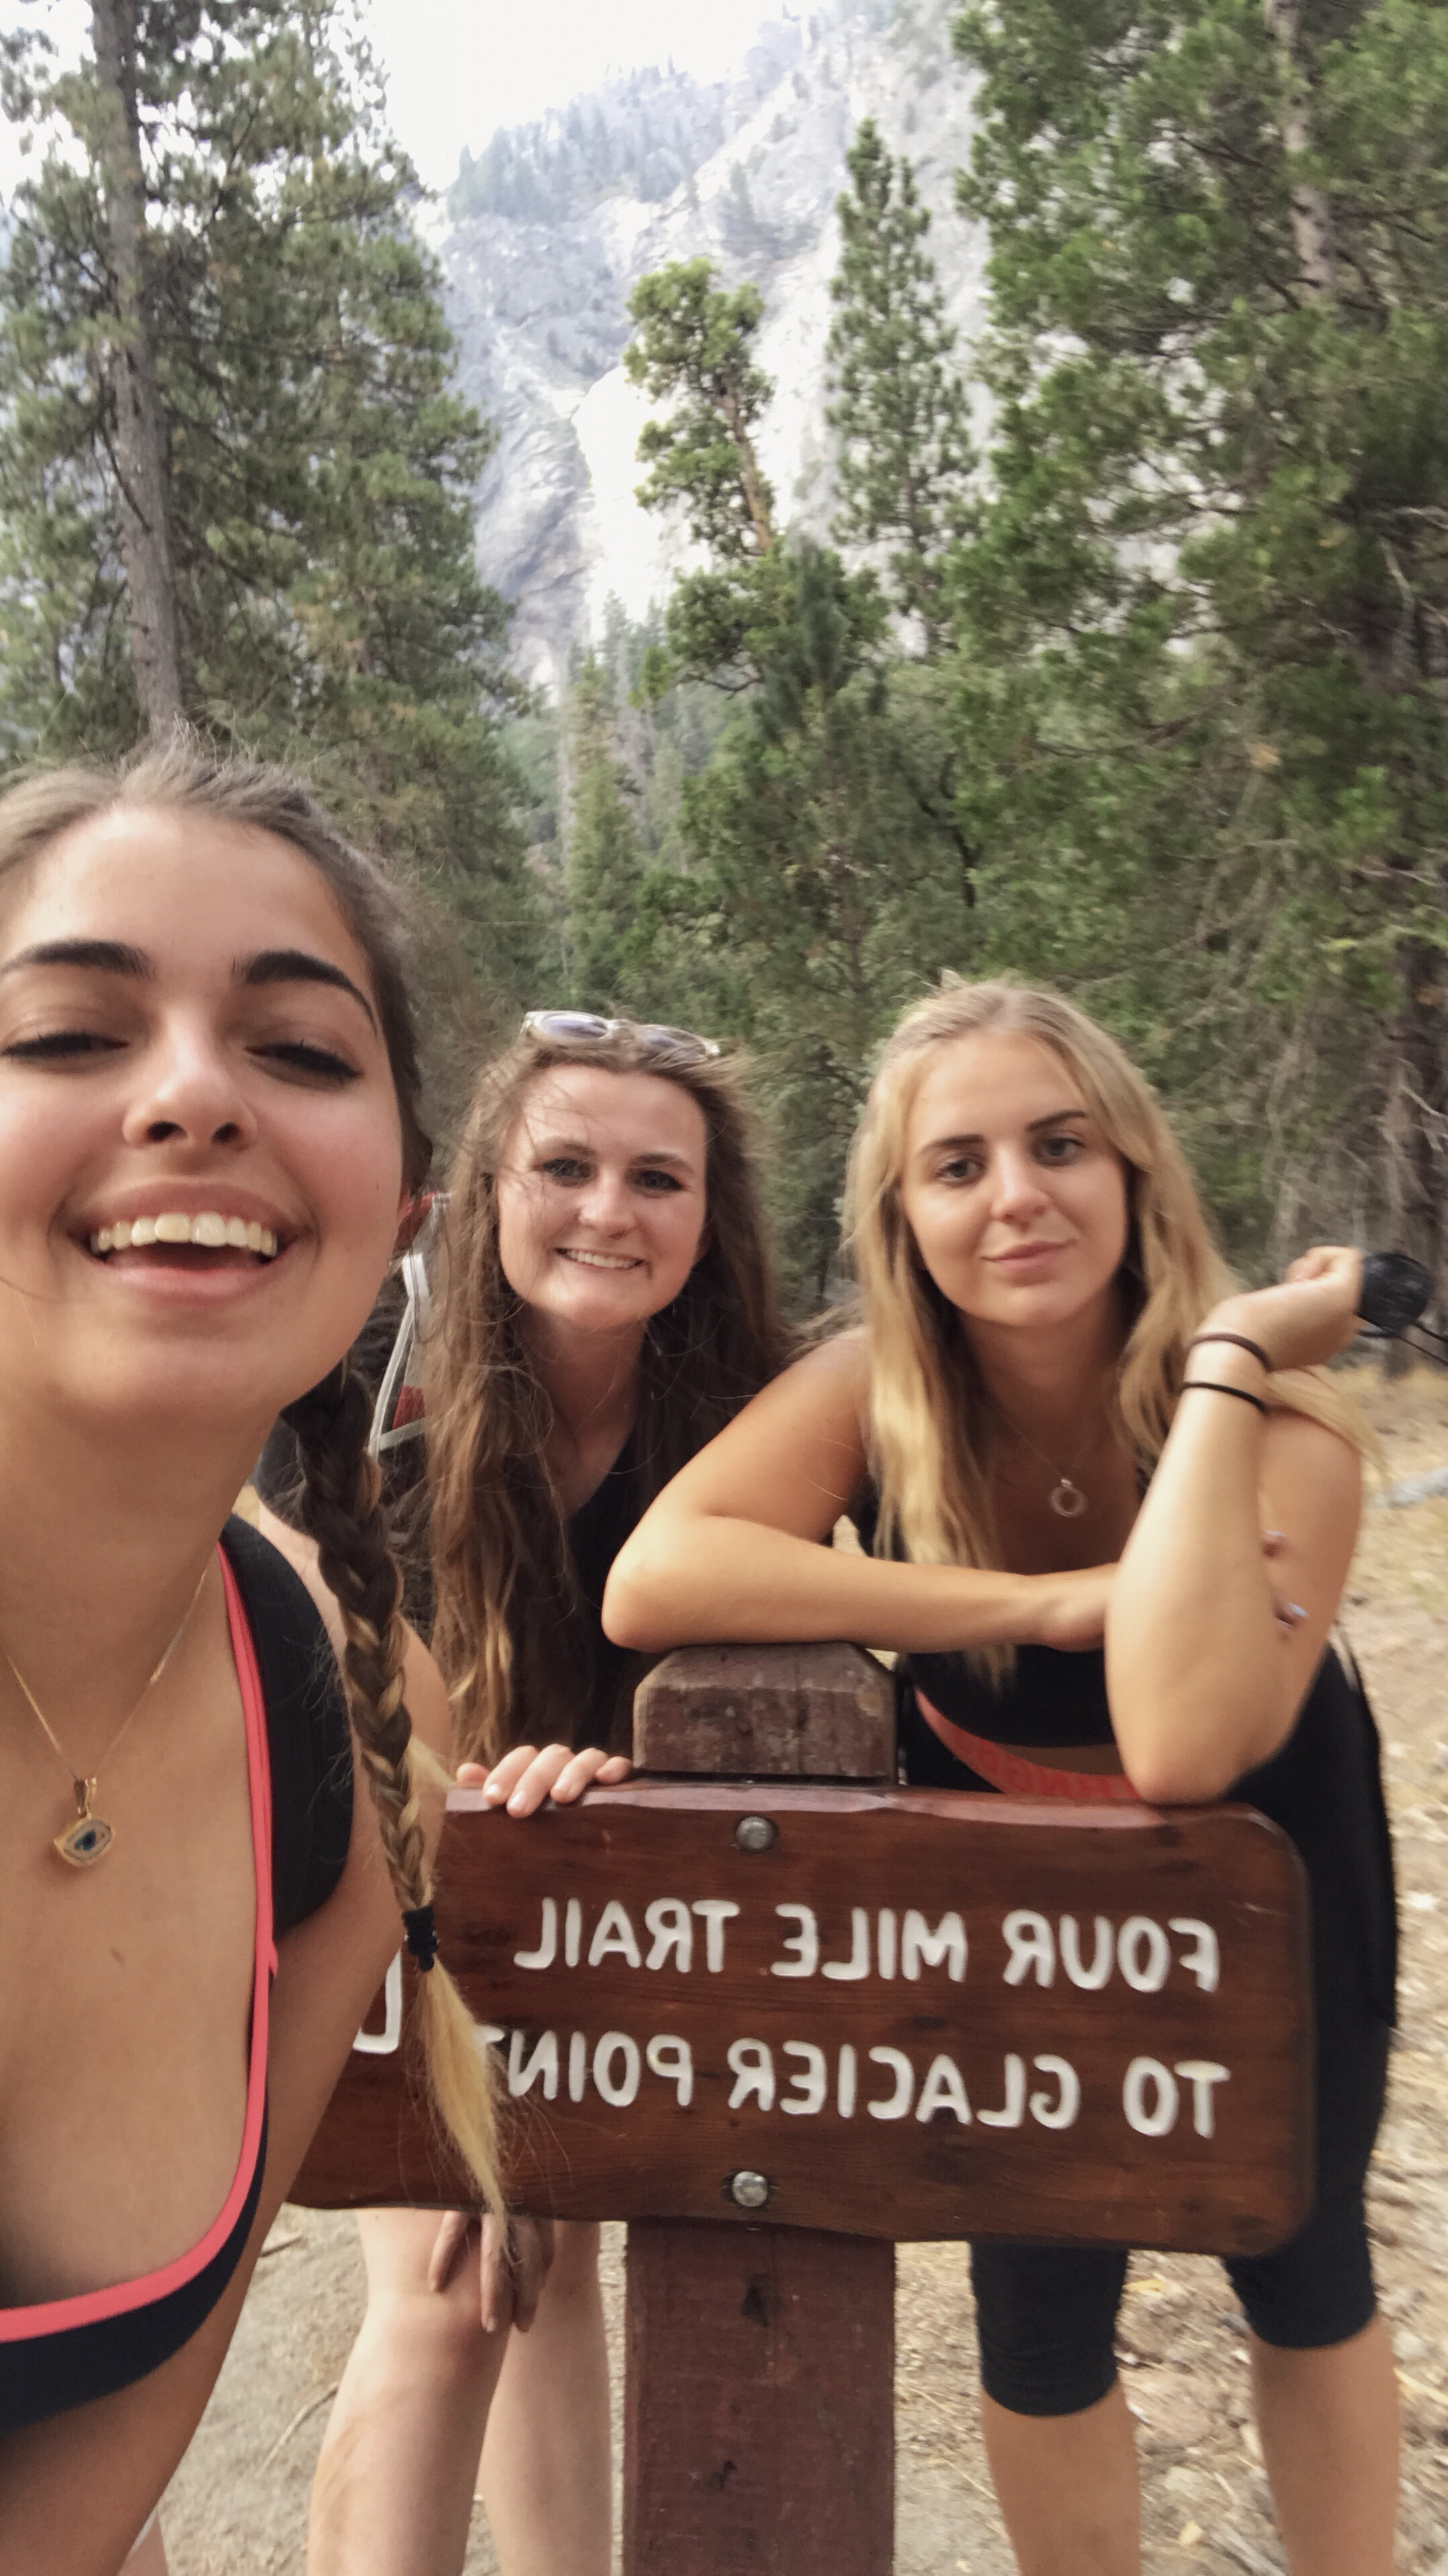 Four mile trail